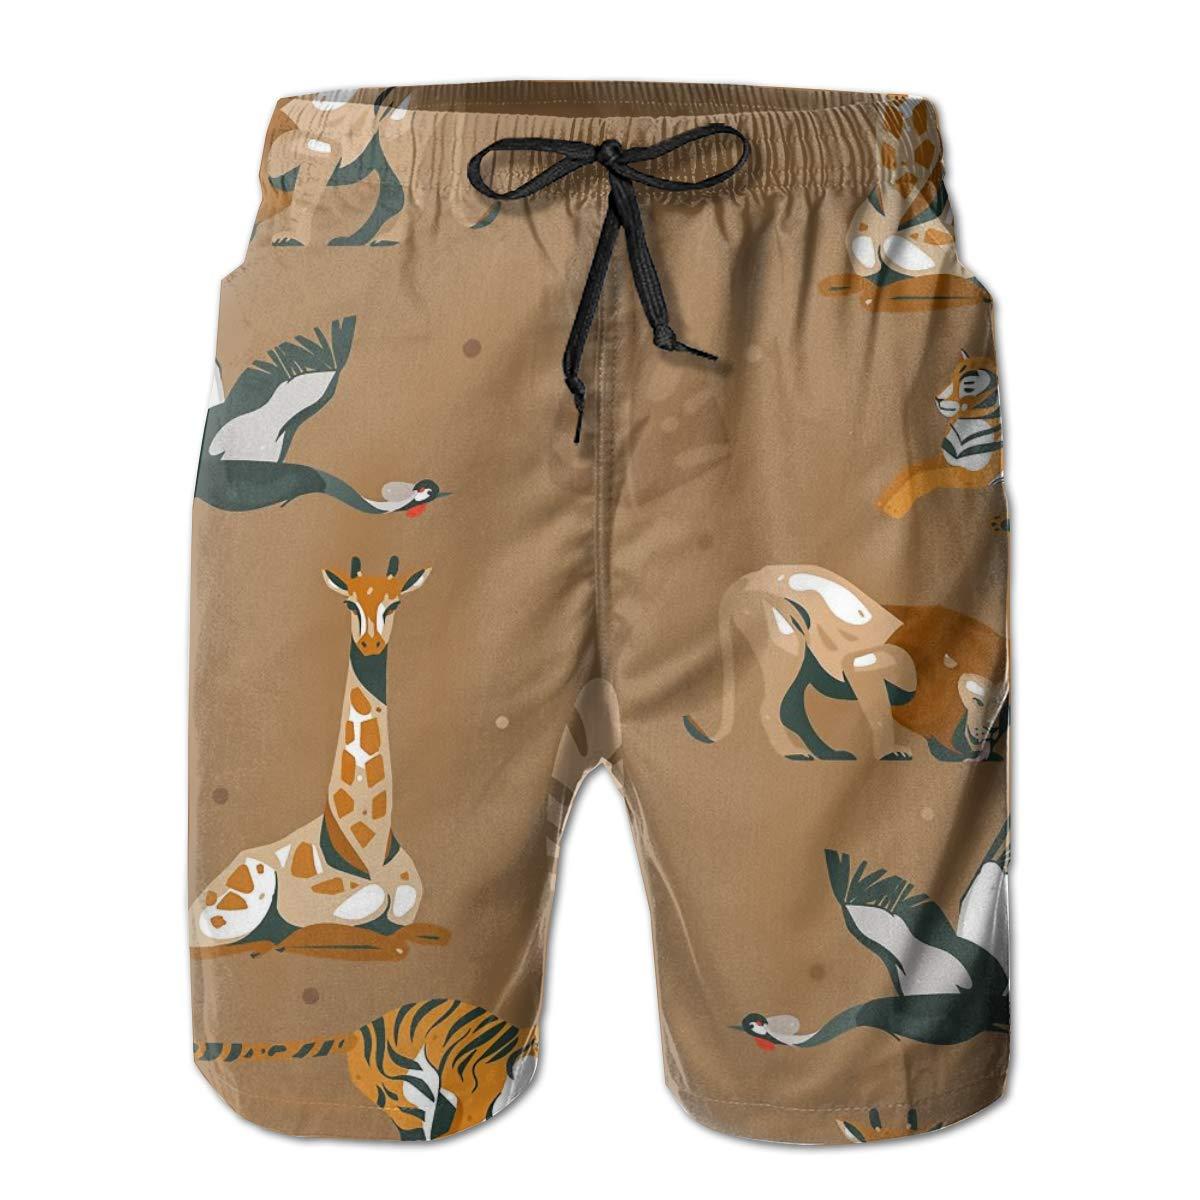 SARA NELL Mens Shorts Giraffe Lion Tiger Modern African Quick Dry Swim Trunks Beach Board Shorts